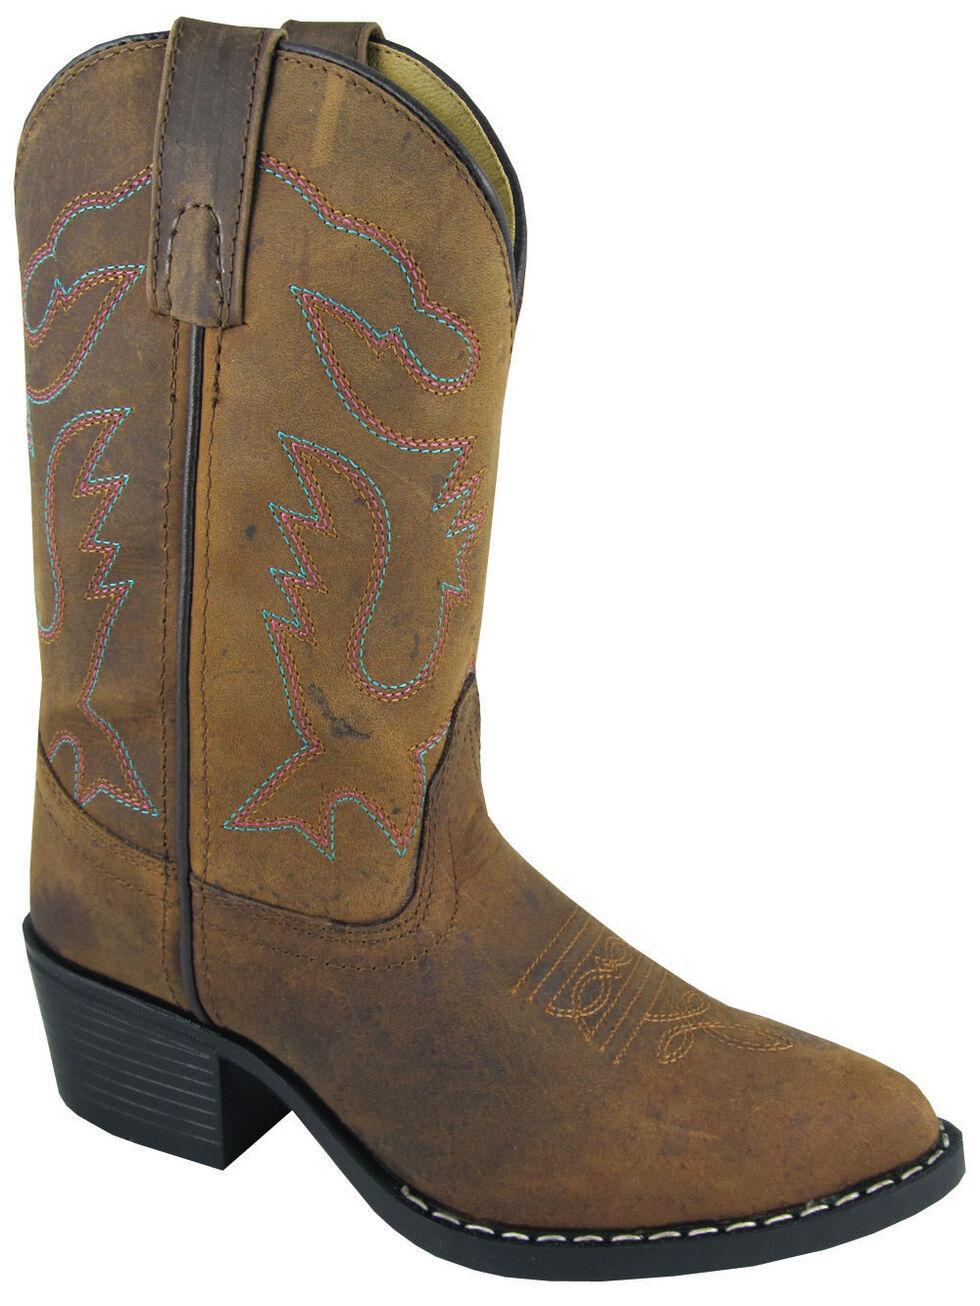 Smoky Mountain Youth Girls' Dakota Western Boots - Medium Toe, Brown, hi-res